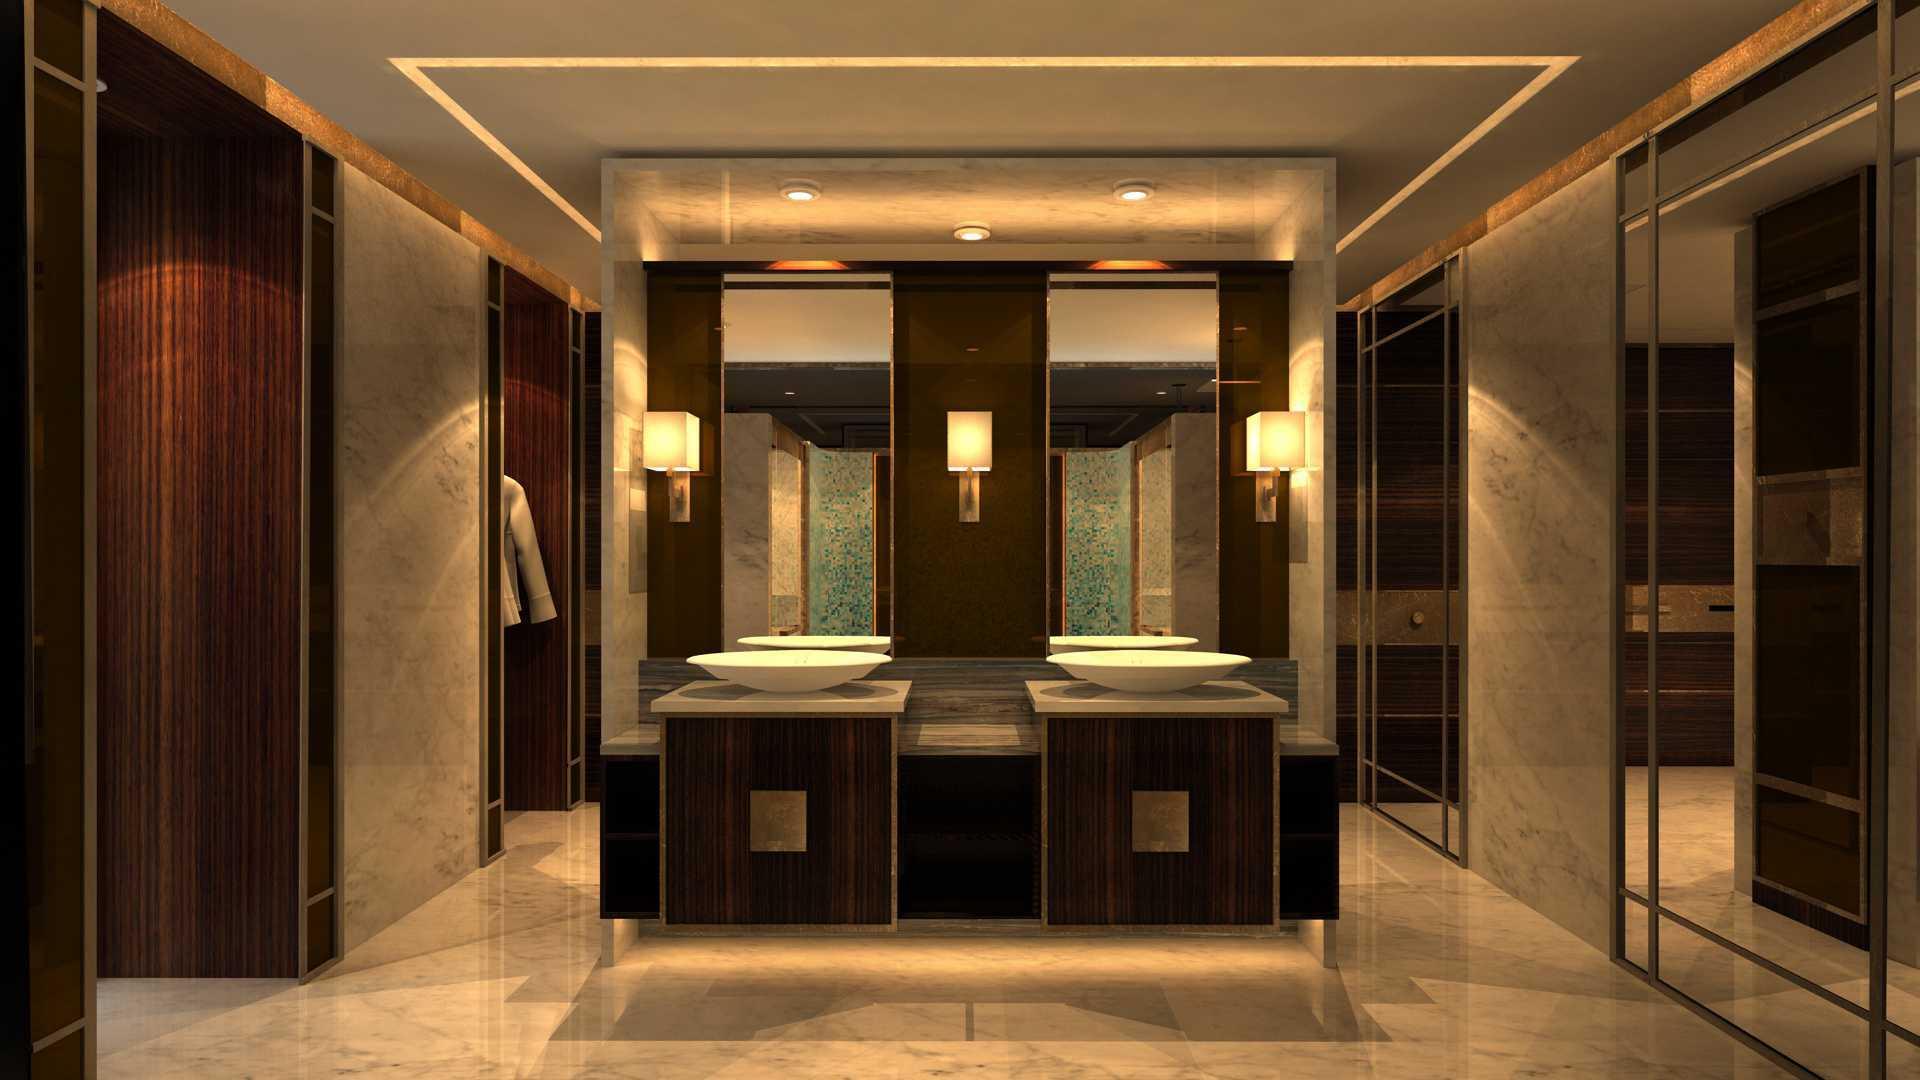 Vin•da•te Mayang Permai Residence Ii - Residential Project (Artist Impression - Construction In Progress) Pantai Indah Kapuk - North Jakarta Pantai Indah Kapuk - North Jakarta Lt Kontemporer  17227